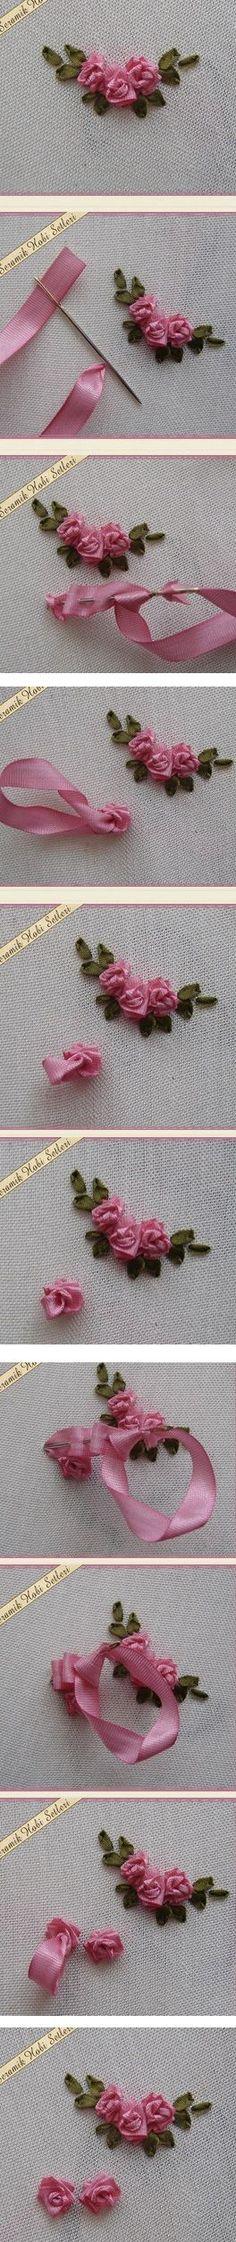 Роза из атласной ленты. Мастер